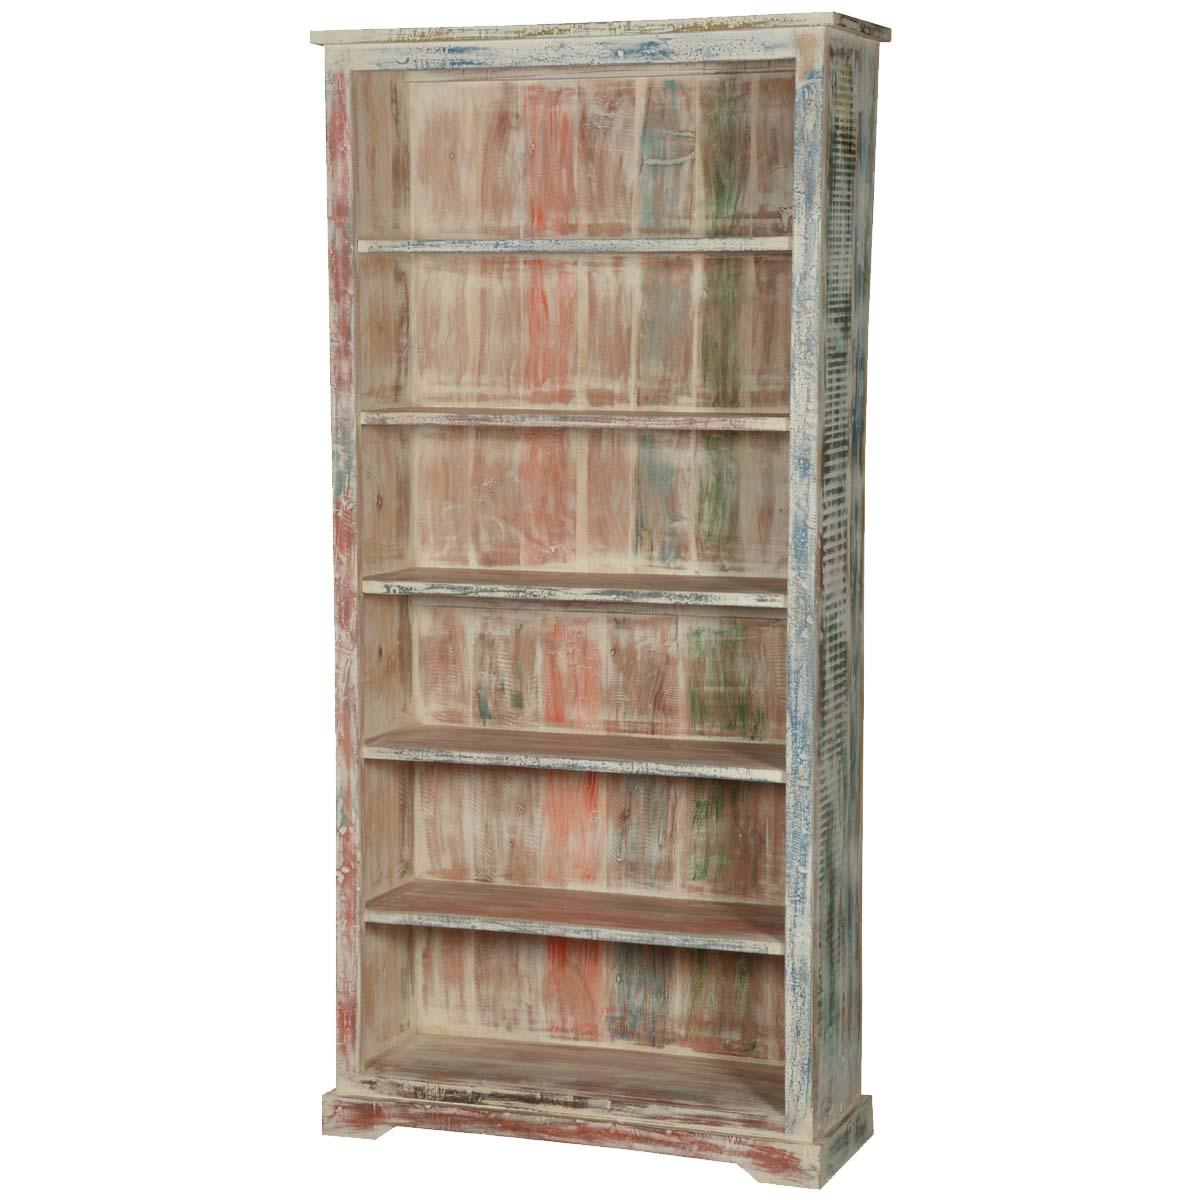 Chickasaw 6 Open Shelf Rustic Reclaimed Wood Standard Bookcase